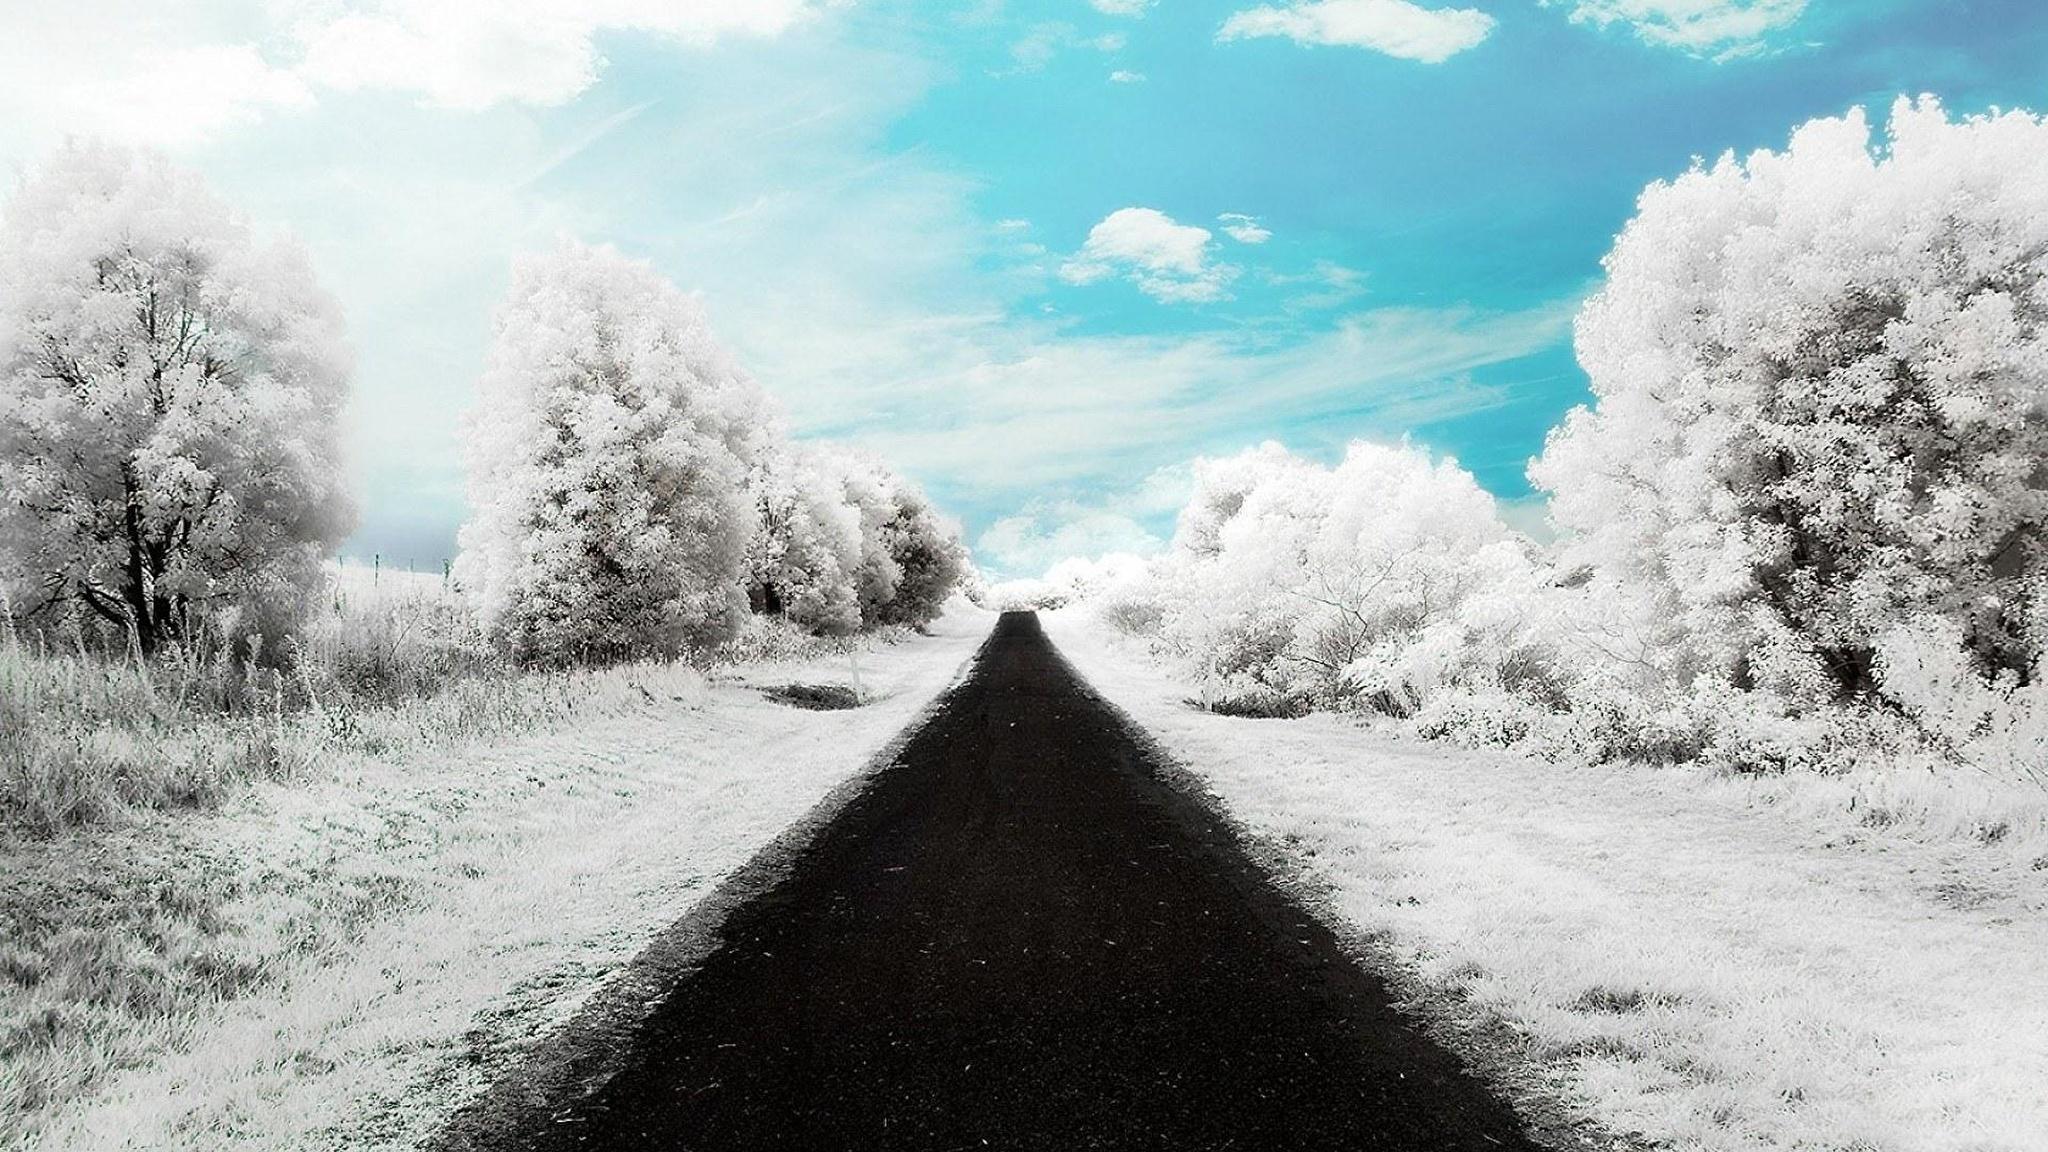 Дорога зимой снег ели небо бесплатно